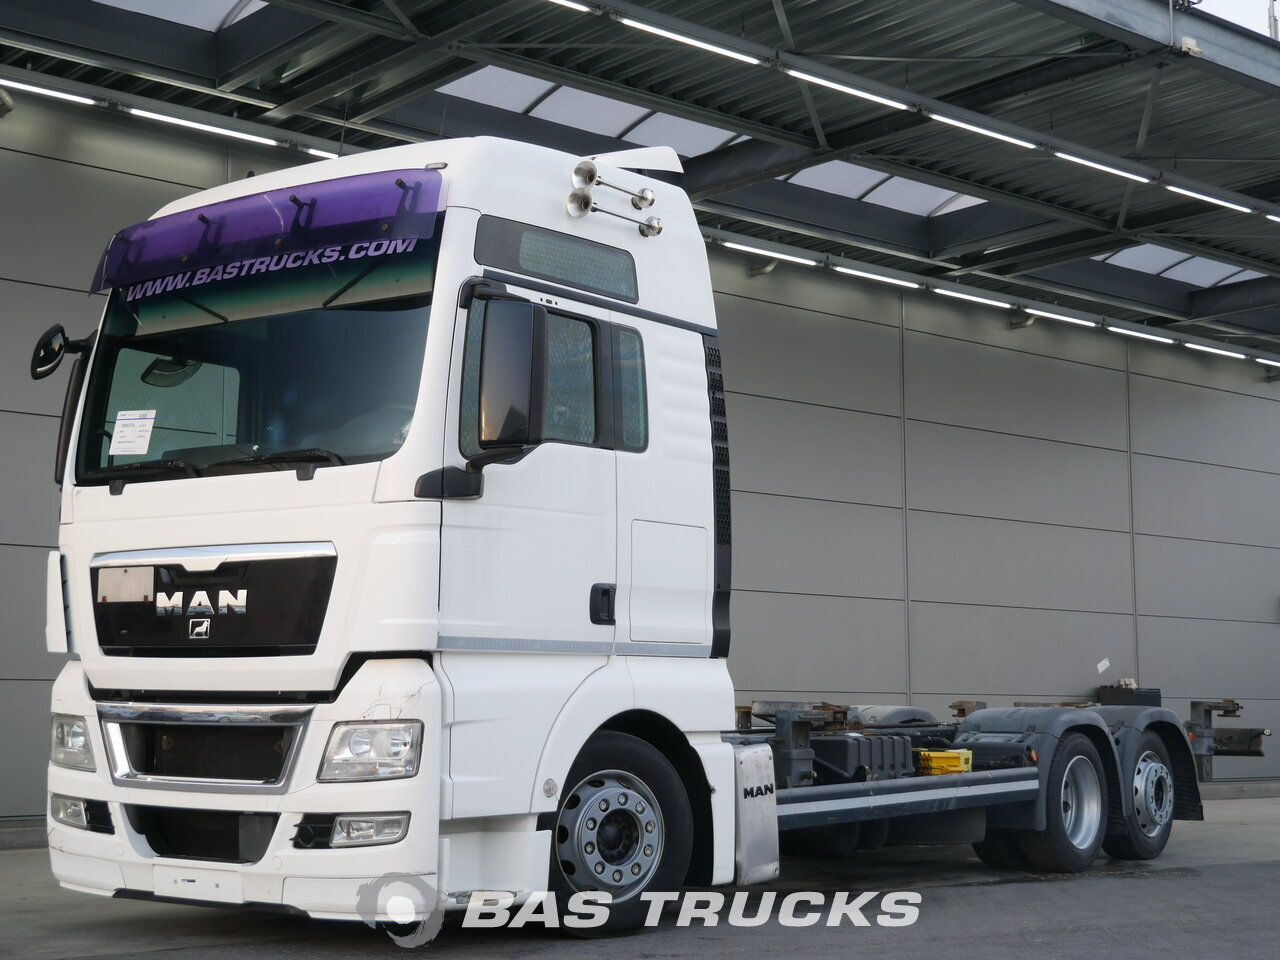 man tgx xxl motrice euro 5 13400 bas trucks. Black Bedroom Furniture Sets. Home Design Ideas